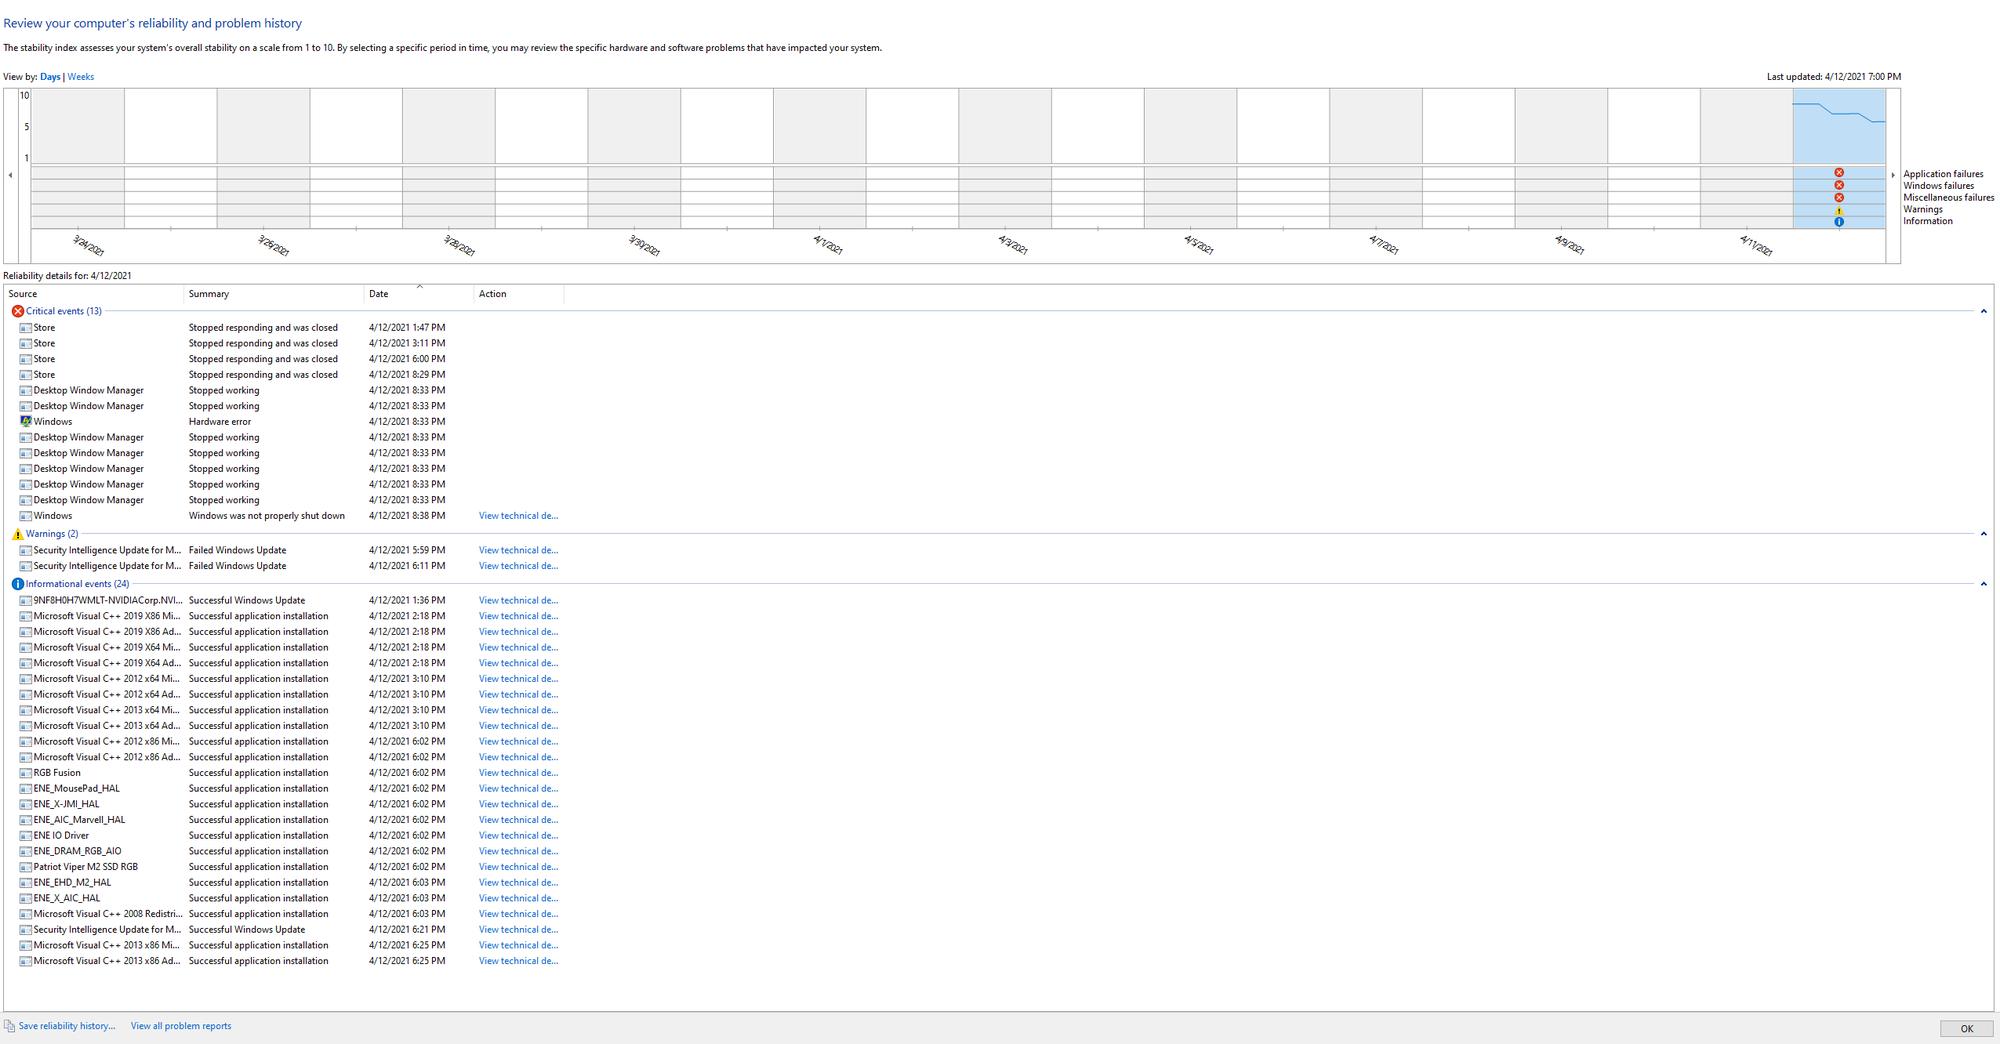 Desktop Window Manager Stopped Working, Resulting in black screen crash 799f1999-0d1d-40de-8249-0ec75ed1896e?upload=true.png